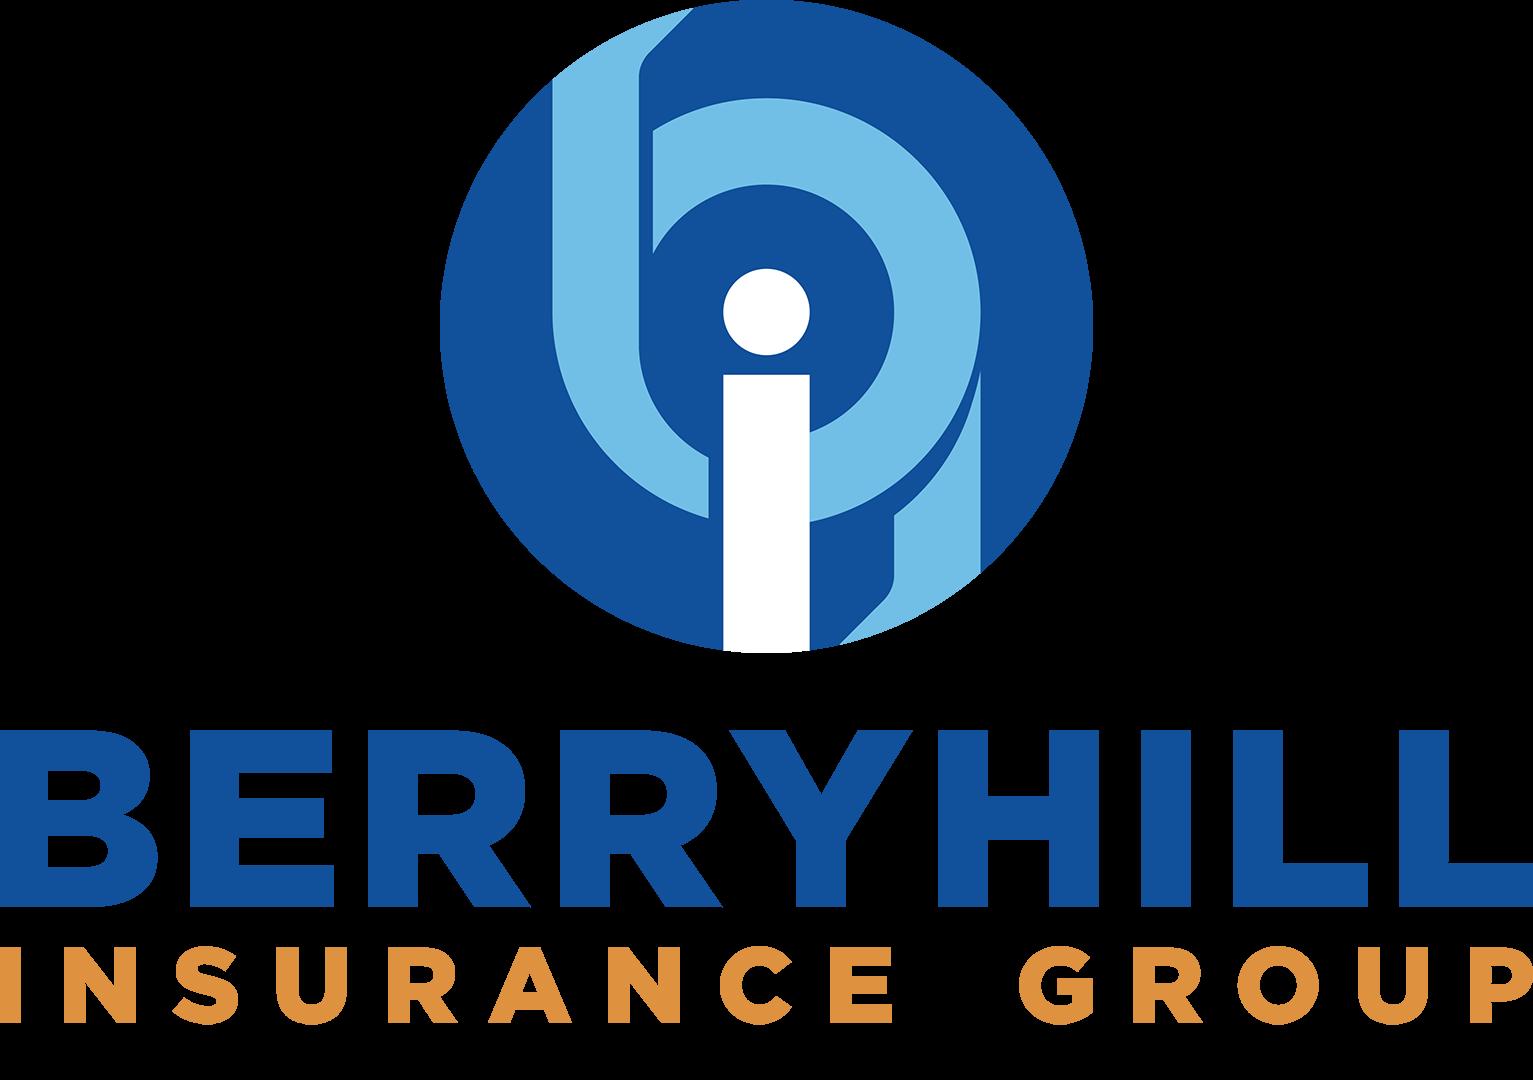 Berryhill Insurance Group